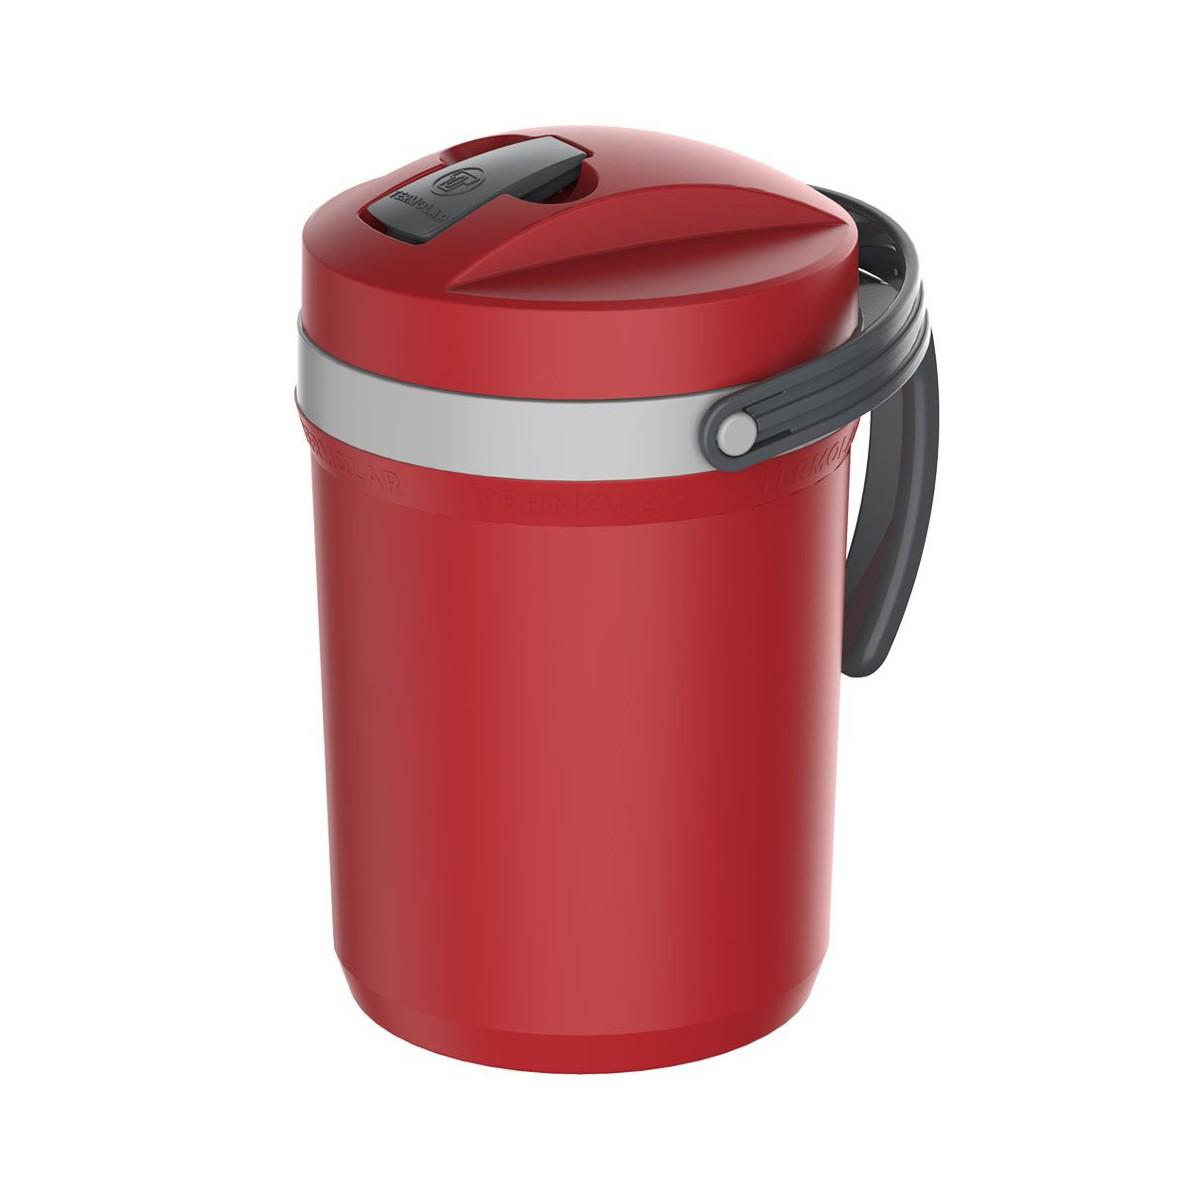 Garrafa Jarra Térmica Fliptop Termolar Vermelha 2,5 Litros